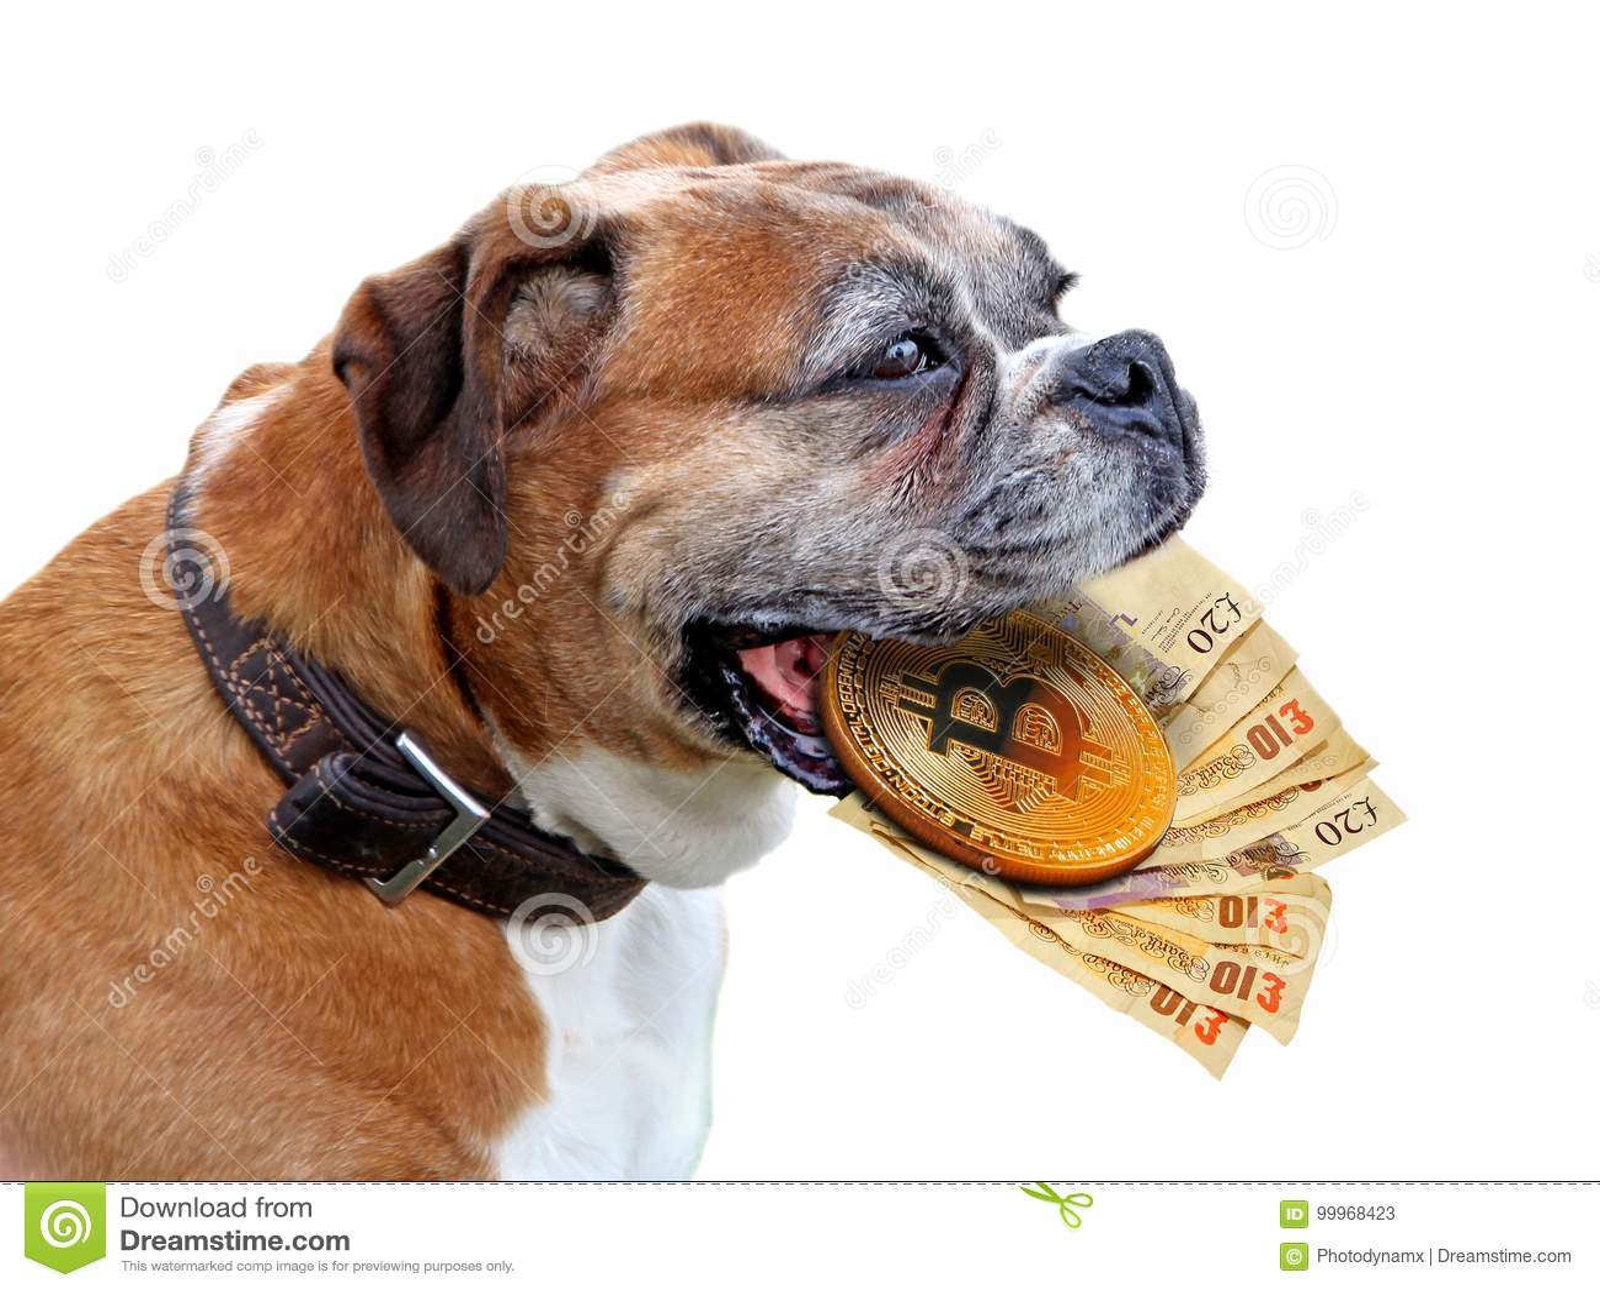 Bitcoins pictures of dogs antonio milicia bettinger